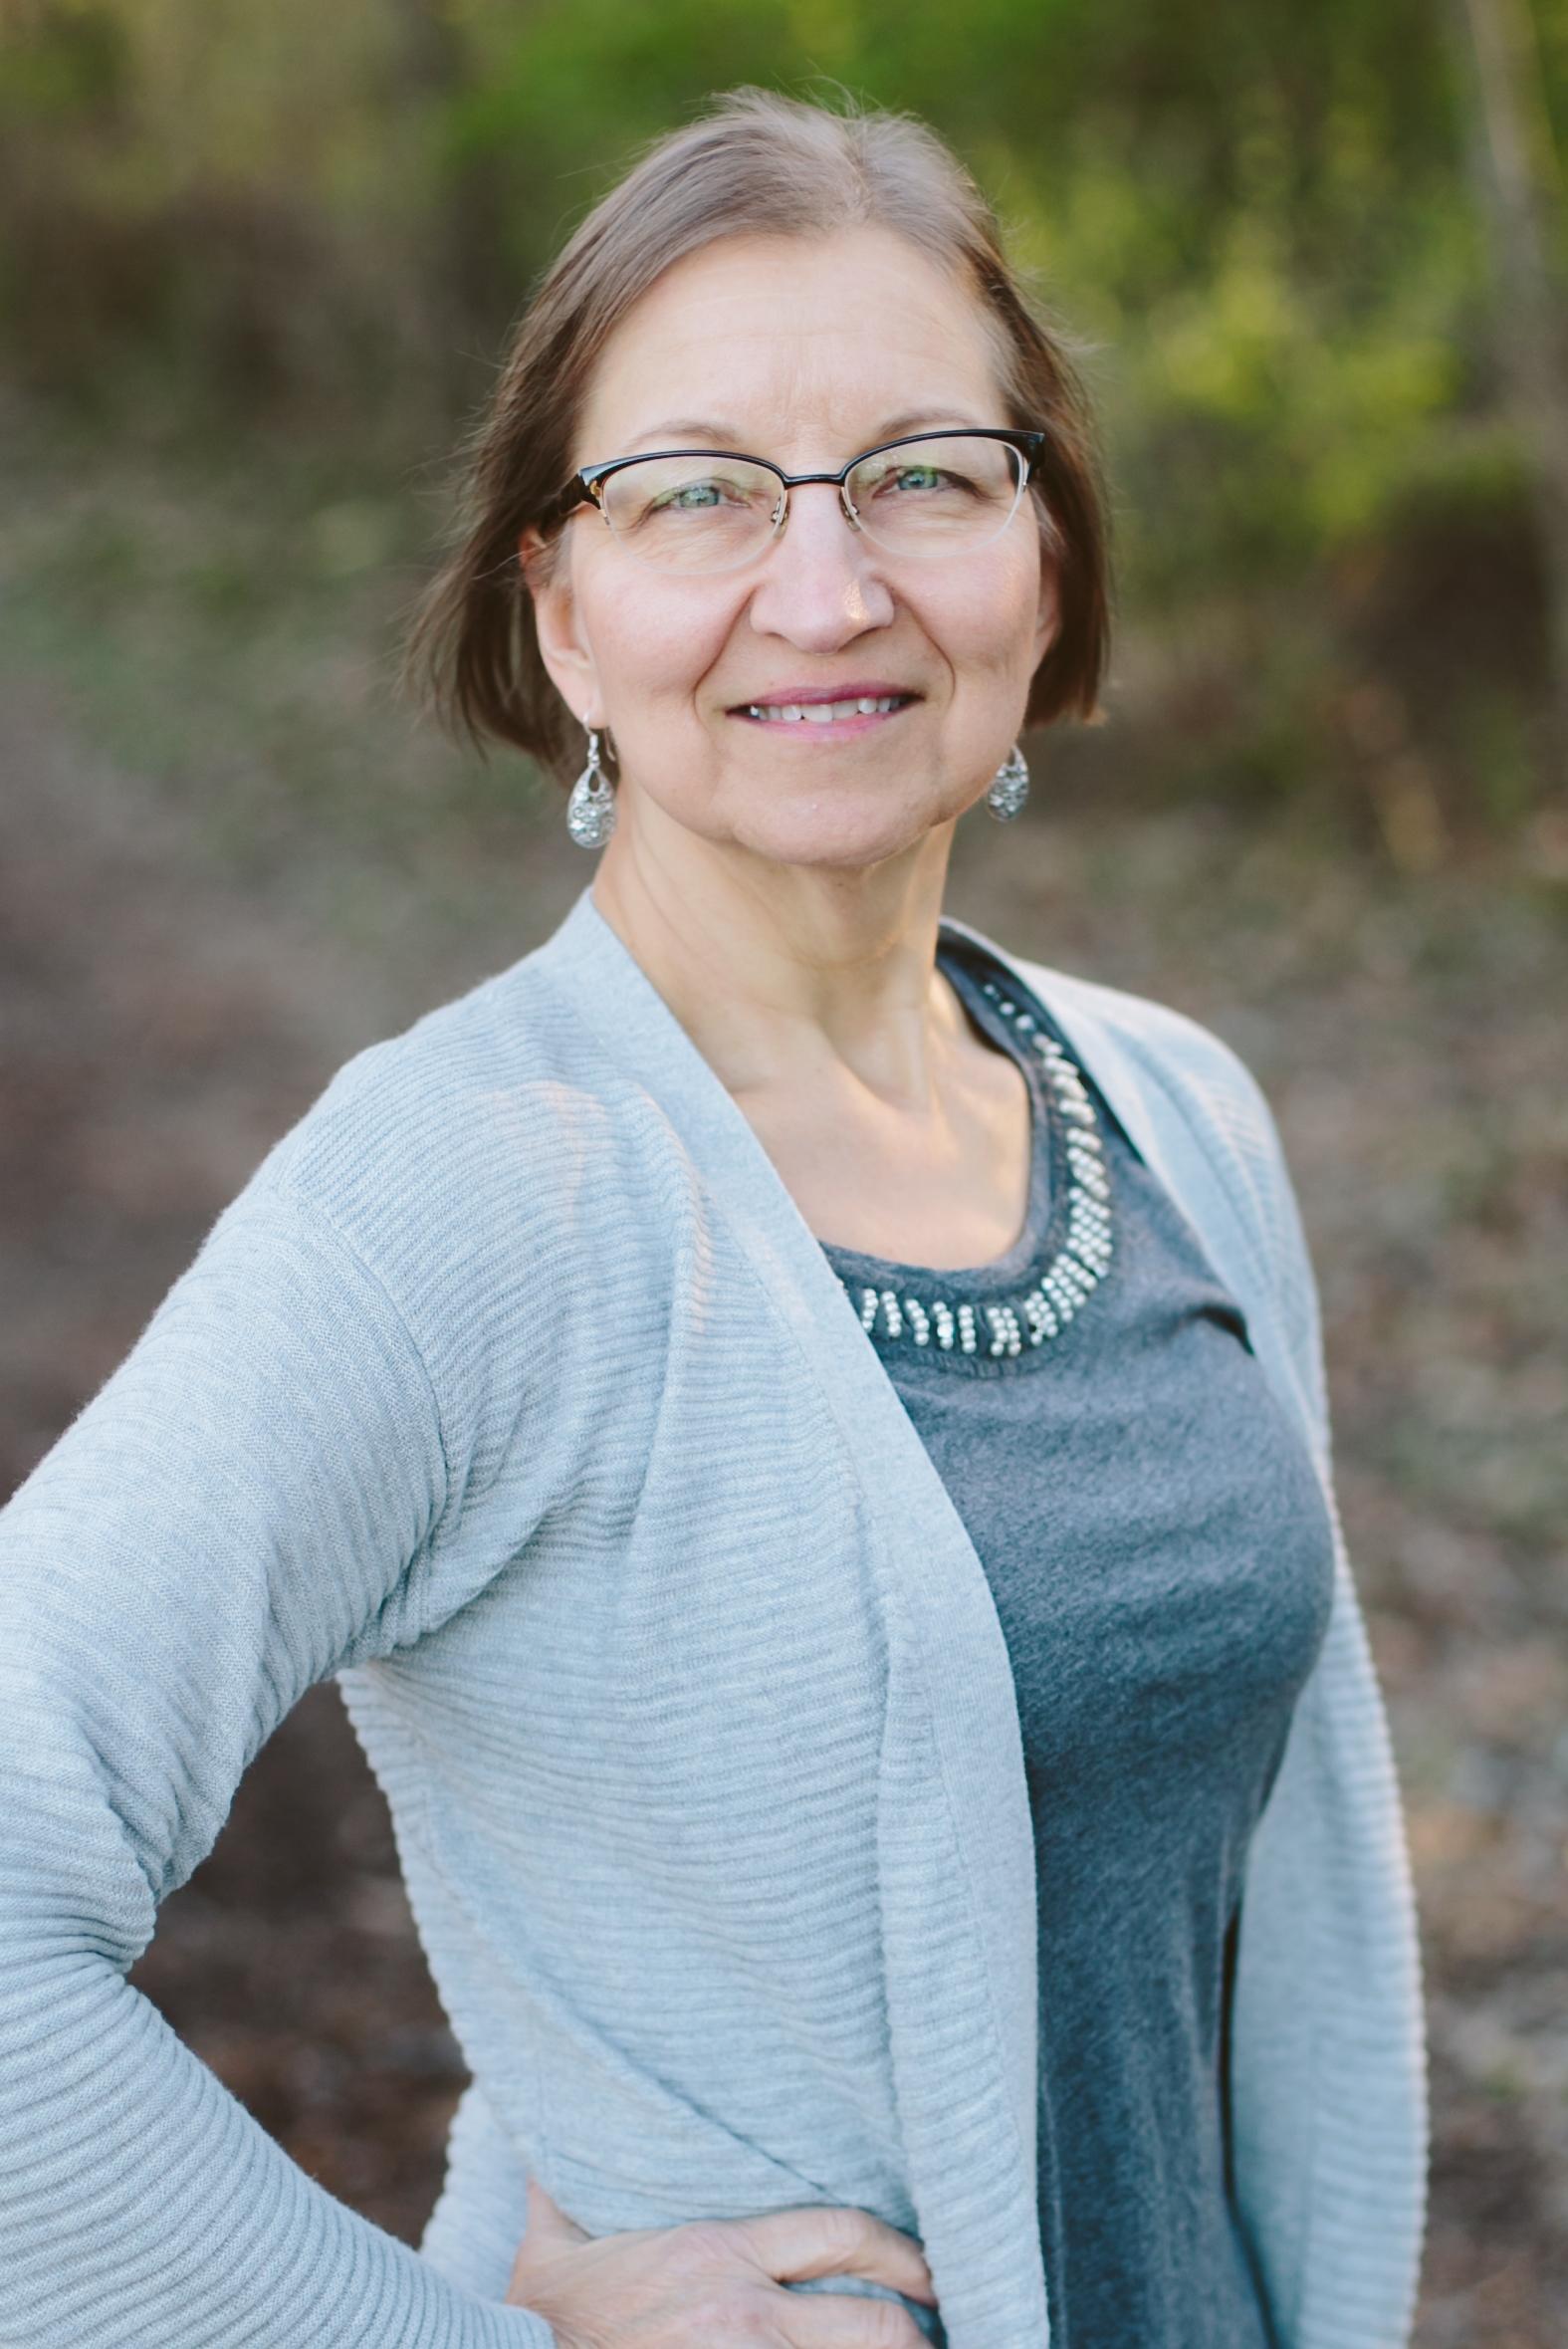 Suzanne Somers BHRT | Karen Miller, MD - Forever Health Practitioner